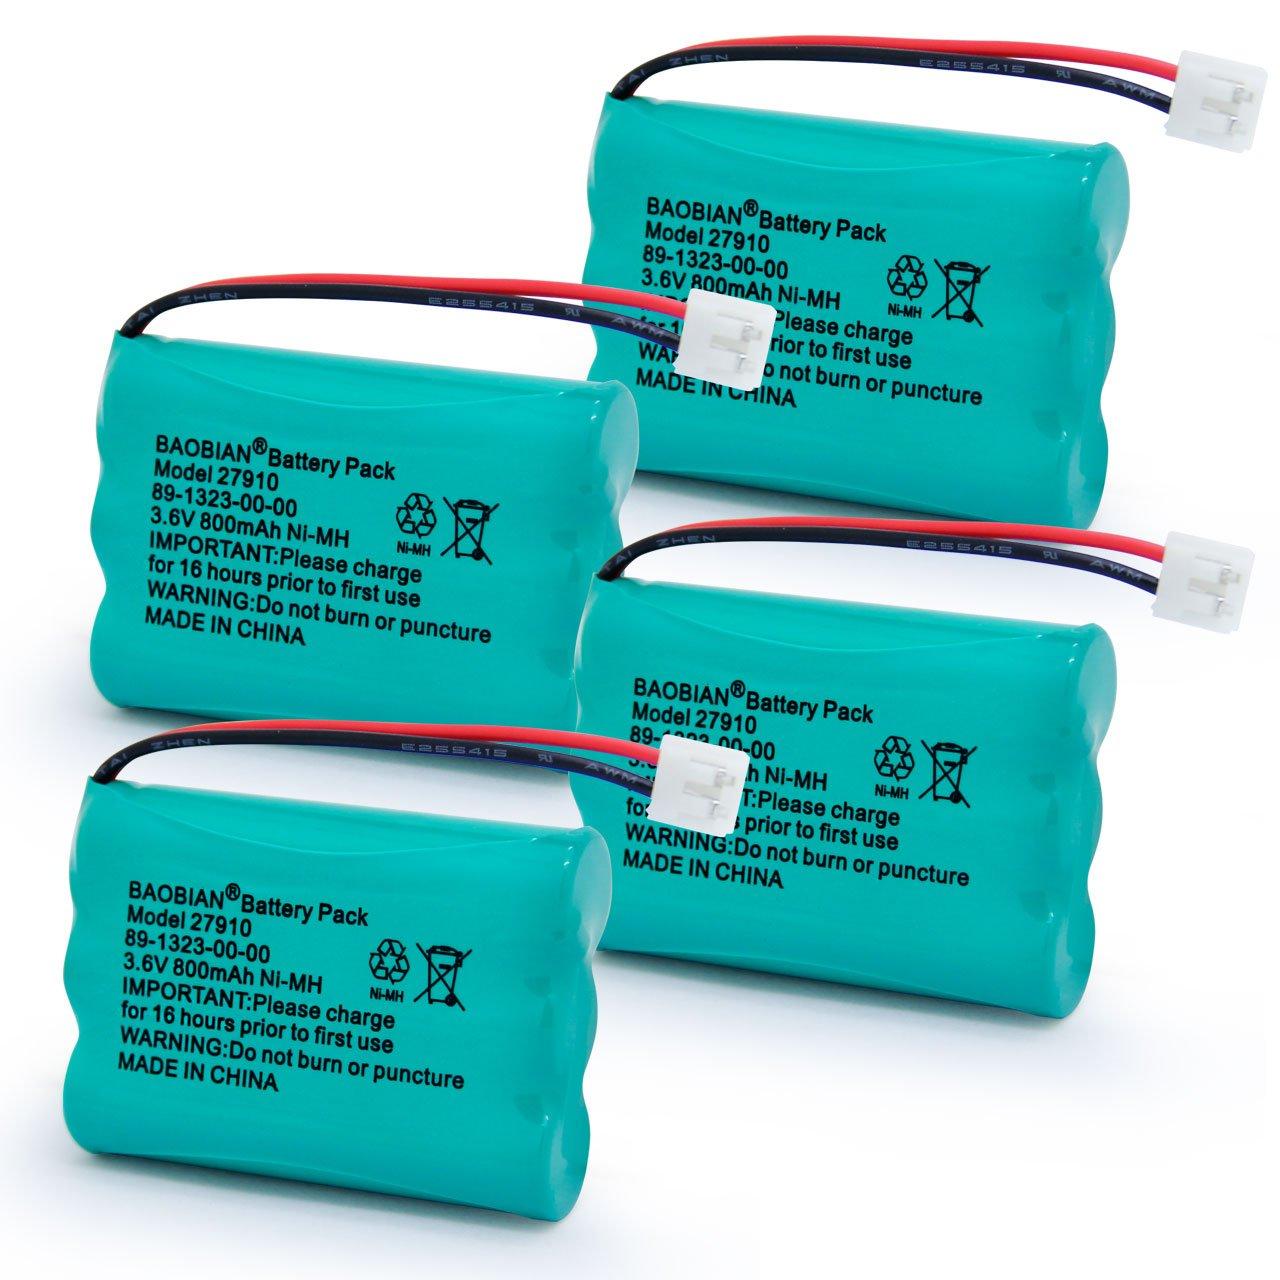 BAOBIAN 27910 Rechargeable Cordless Phone Battery Compatible V-Tech 89-1323-00-00 Vtech 27910 I6725 Motorola SD-7501 RadioShack 23-959(2 Pack) BB0227910